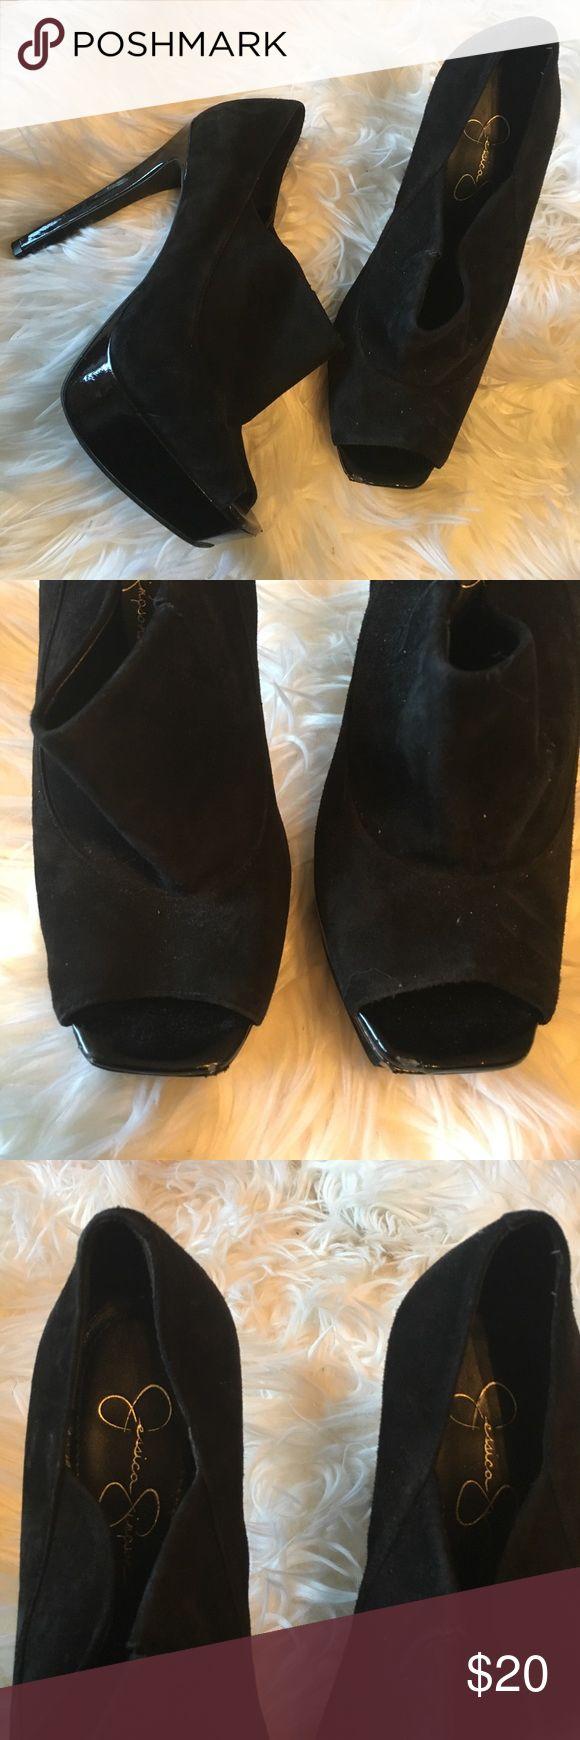 Jessica Simpson Patent Suede Platform Pumps 1-inch Platform, 5-inch Heel Jessica Simpson Shoes Heels